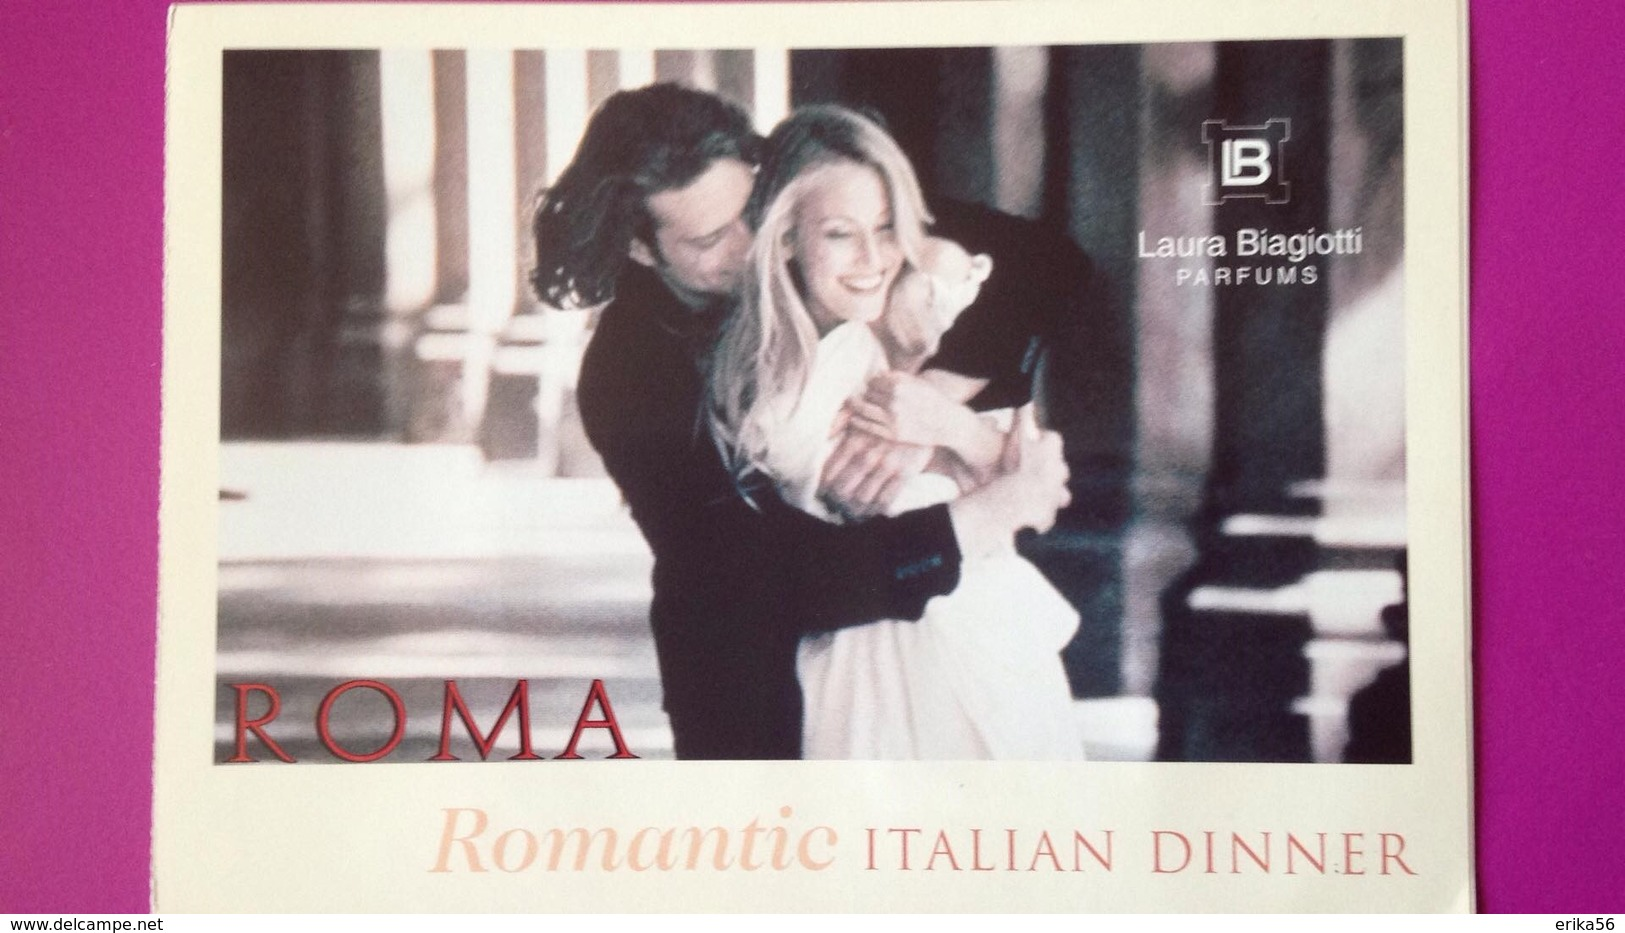 ROMA  UOMO + DONNA  LAURA BIAGIOTTI - Perfume Cards